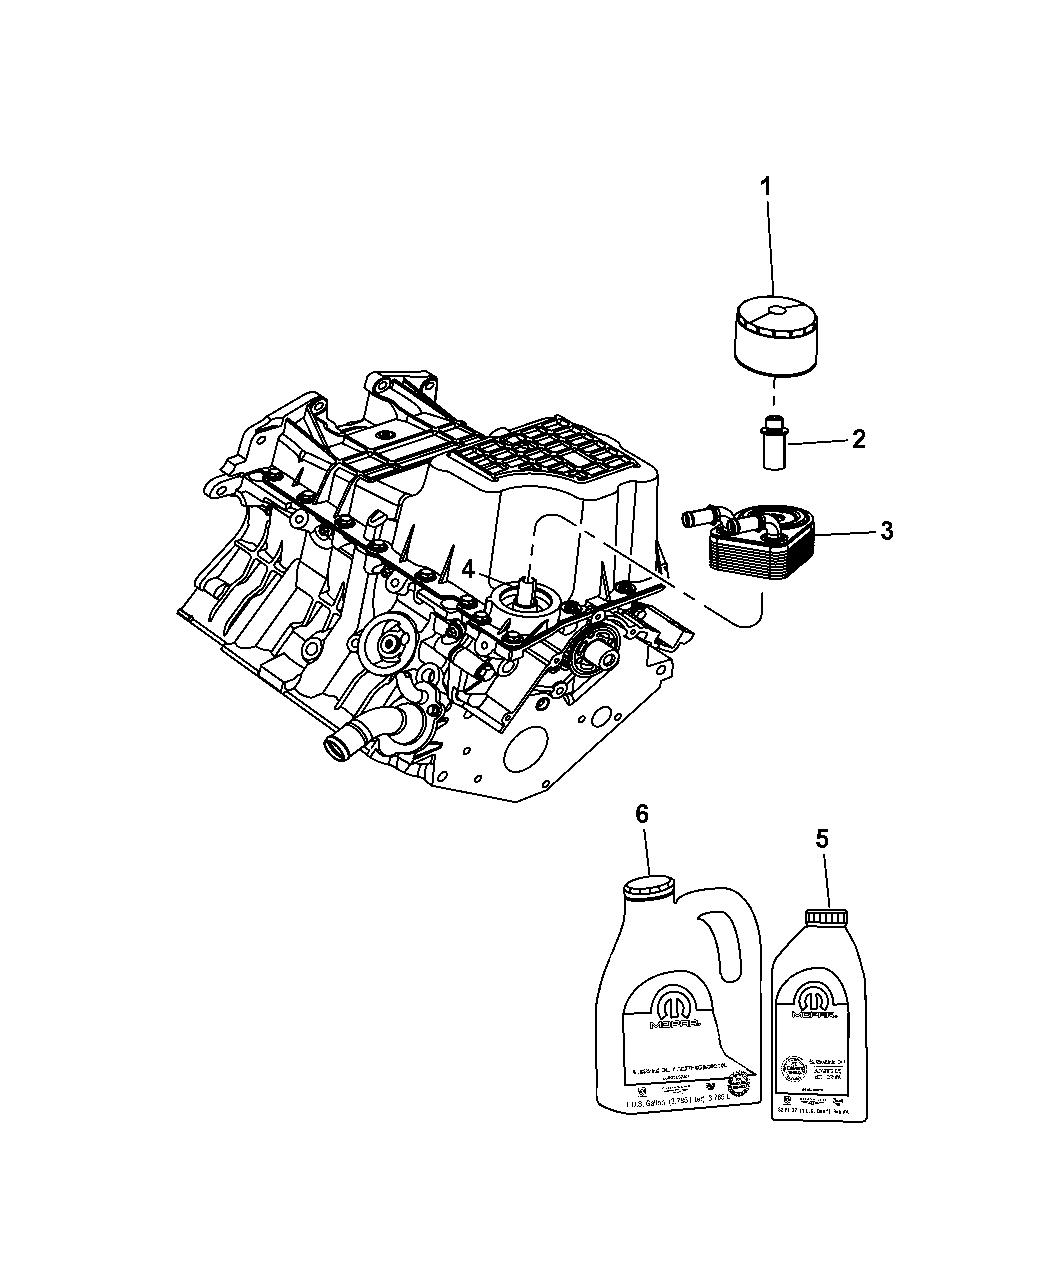 2011 Dodge Nitro Engine Oil, Engine Oil Filter, Adapter And Splash Guard -  Thumbnail